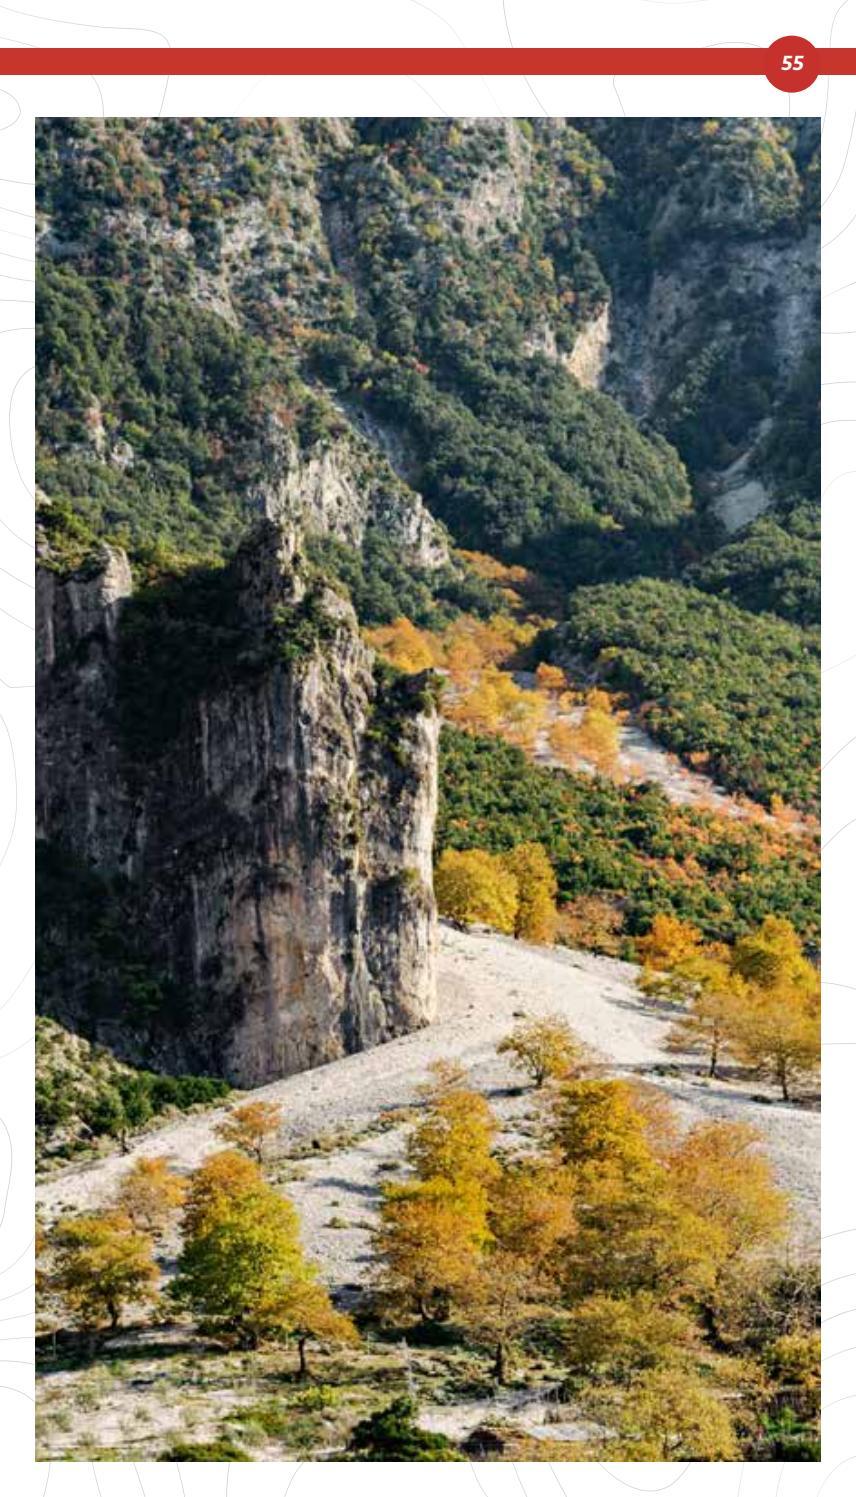 Hiking Trails in Himara Region page 55